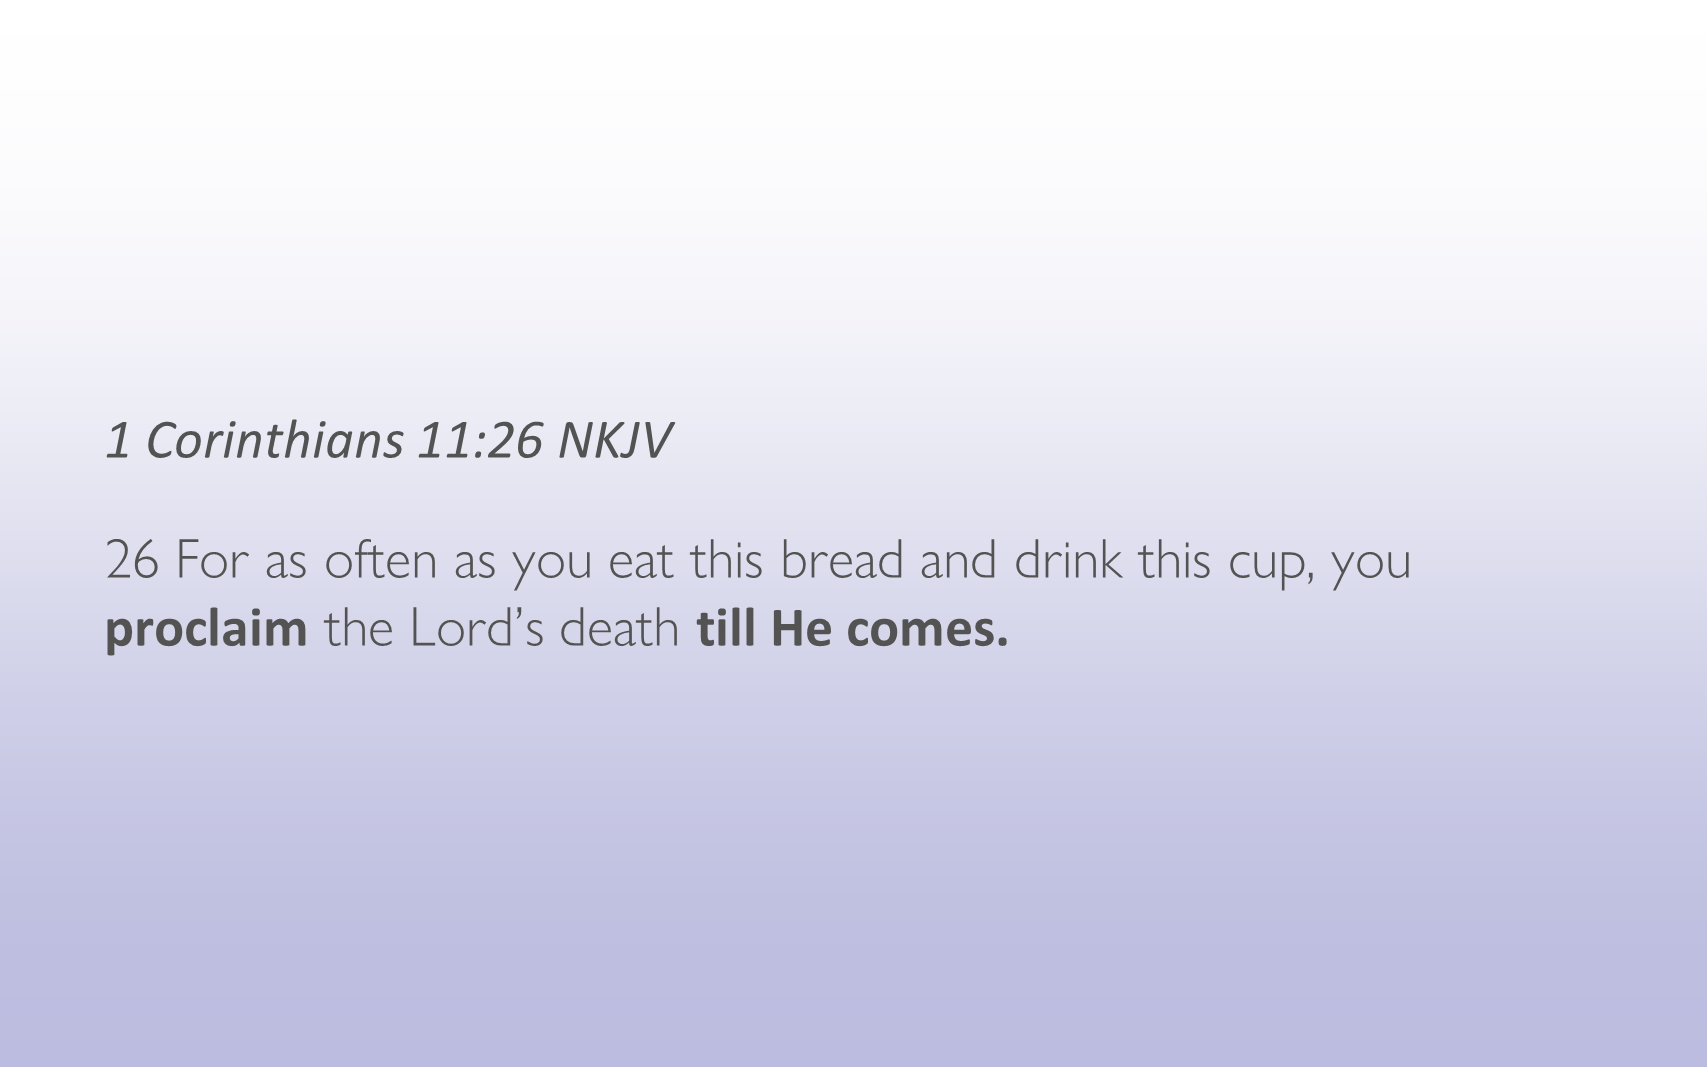 WCC-03 - Proclaiming Christ's Cross Regularly (6)